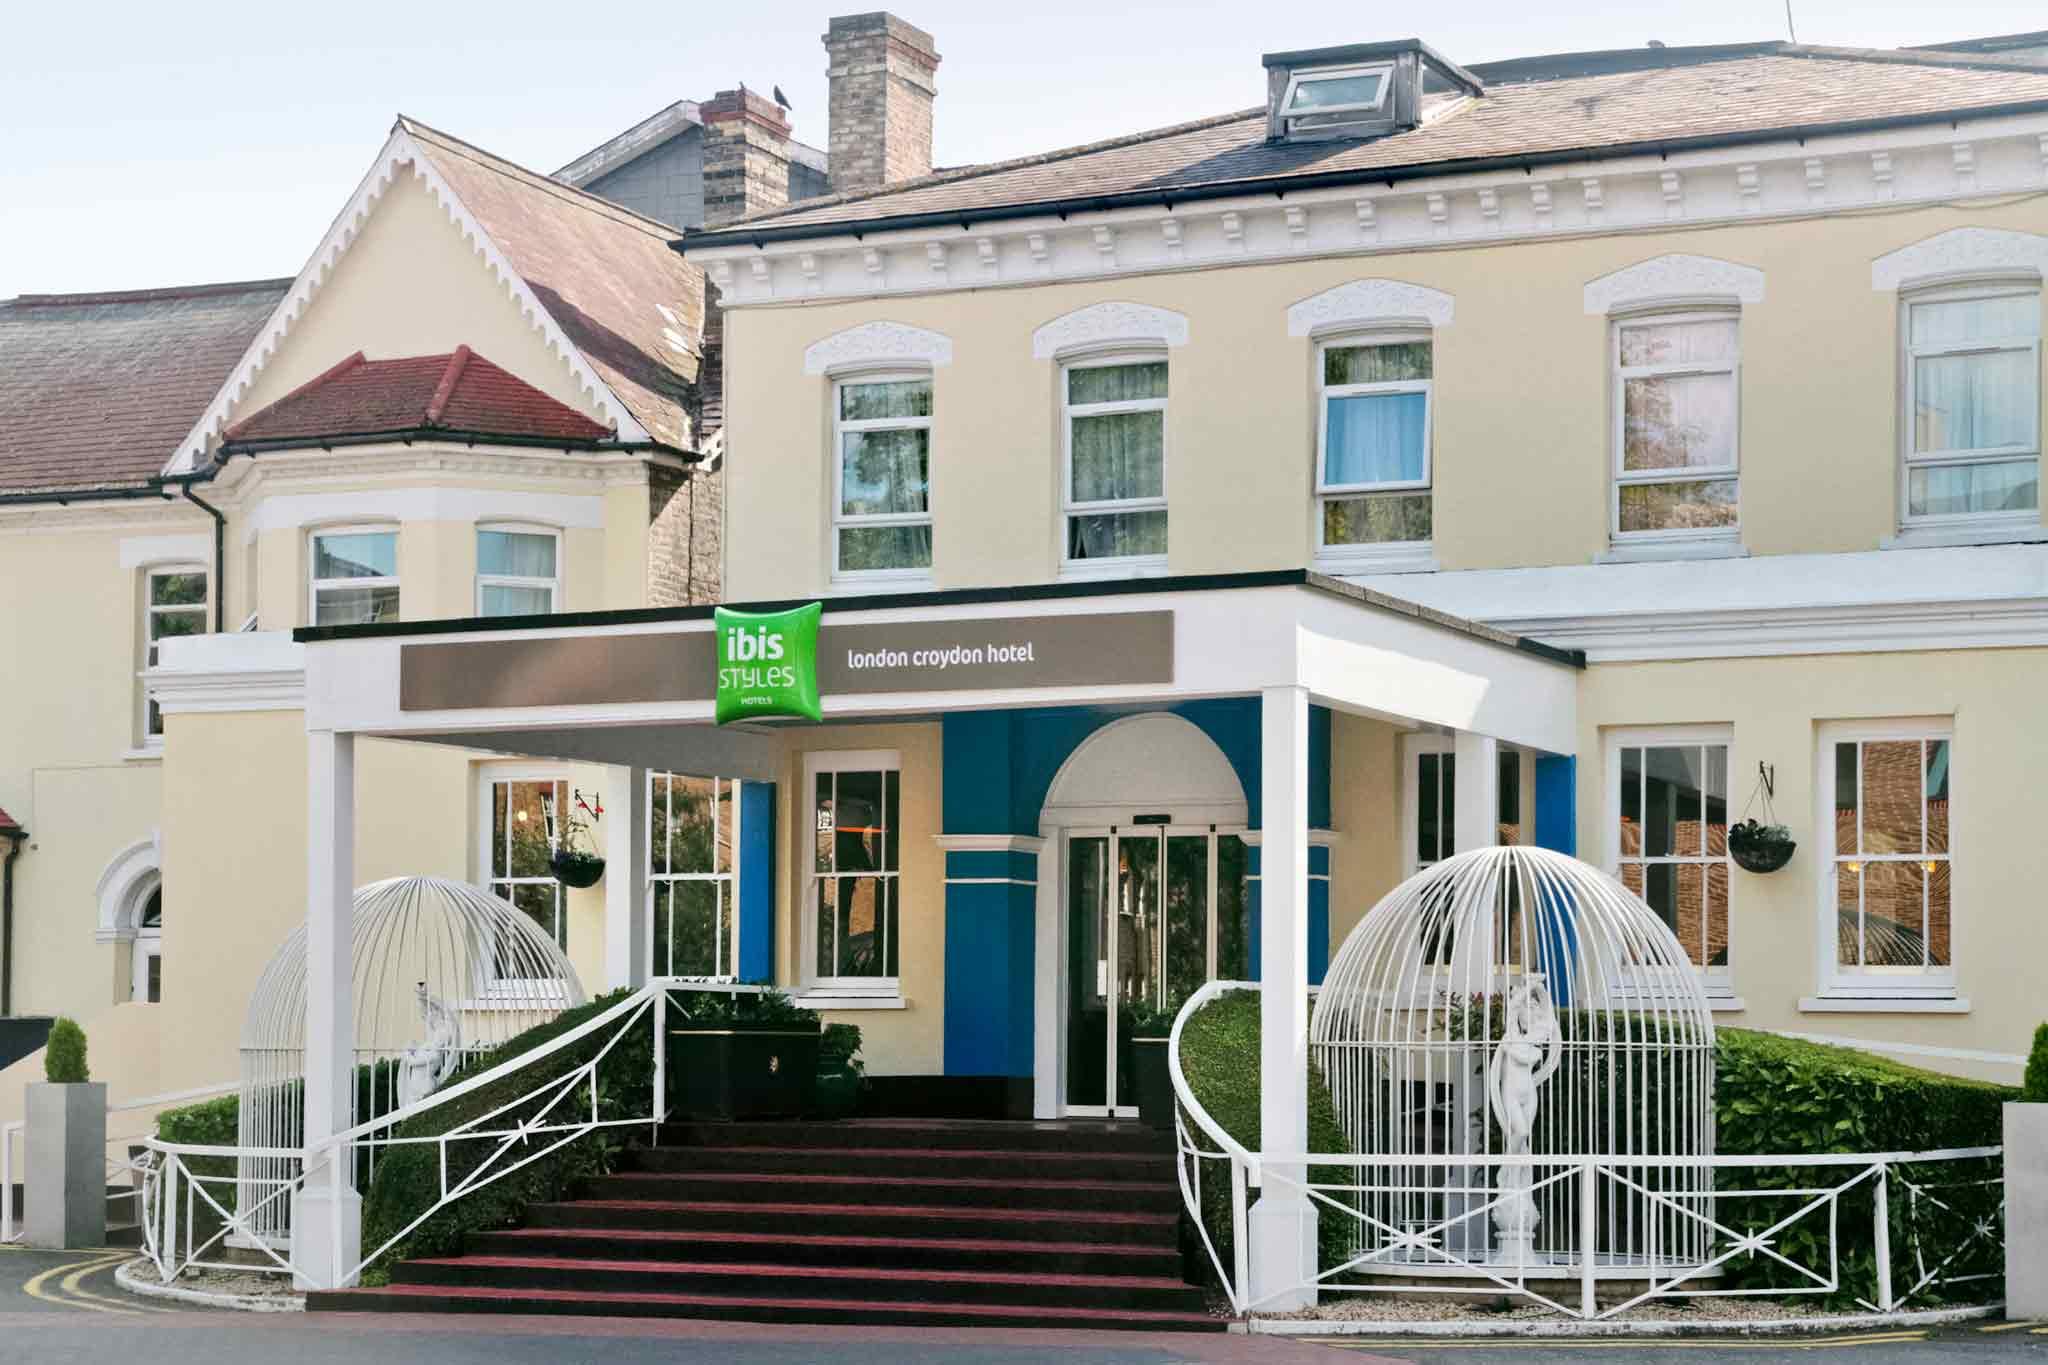 Hotel Ibis Styles London Croydon